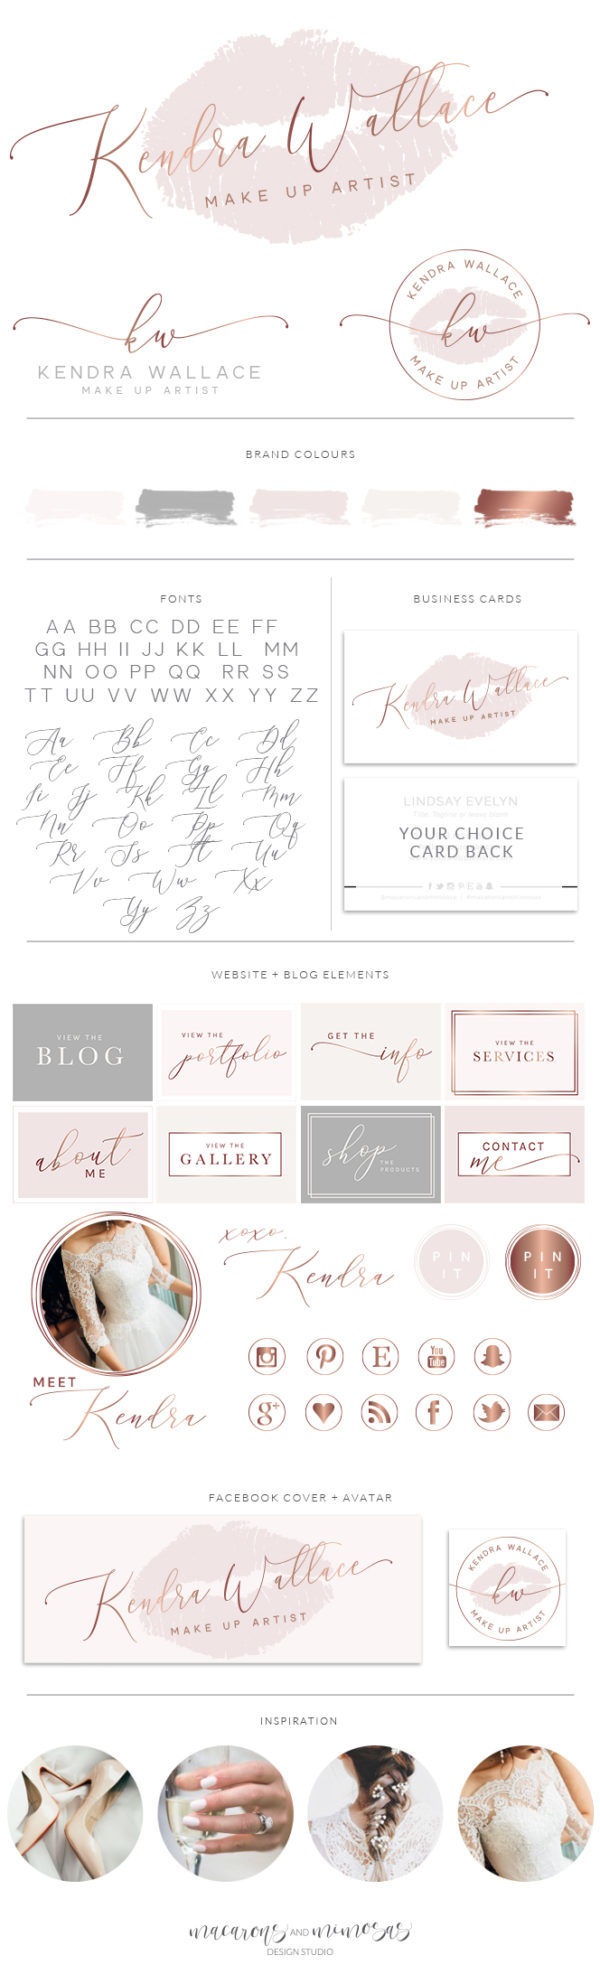 lips Logo, Rose Gold lips kiss Branding Set, Stamp Watermark, Beauty Salon Boutique, Make up Artist, Marketing Kit, Makeup Logo Design